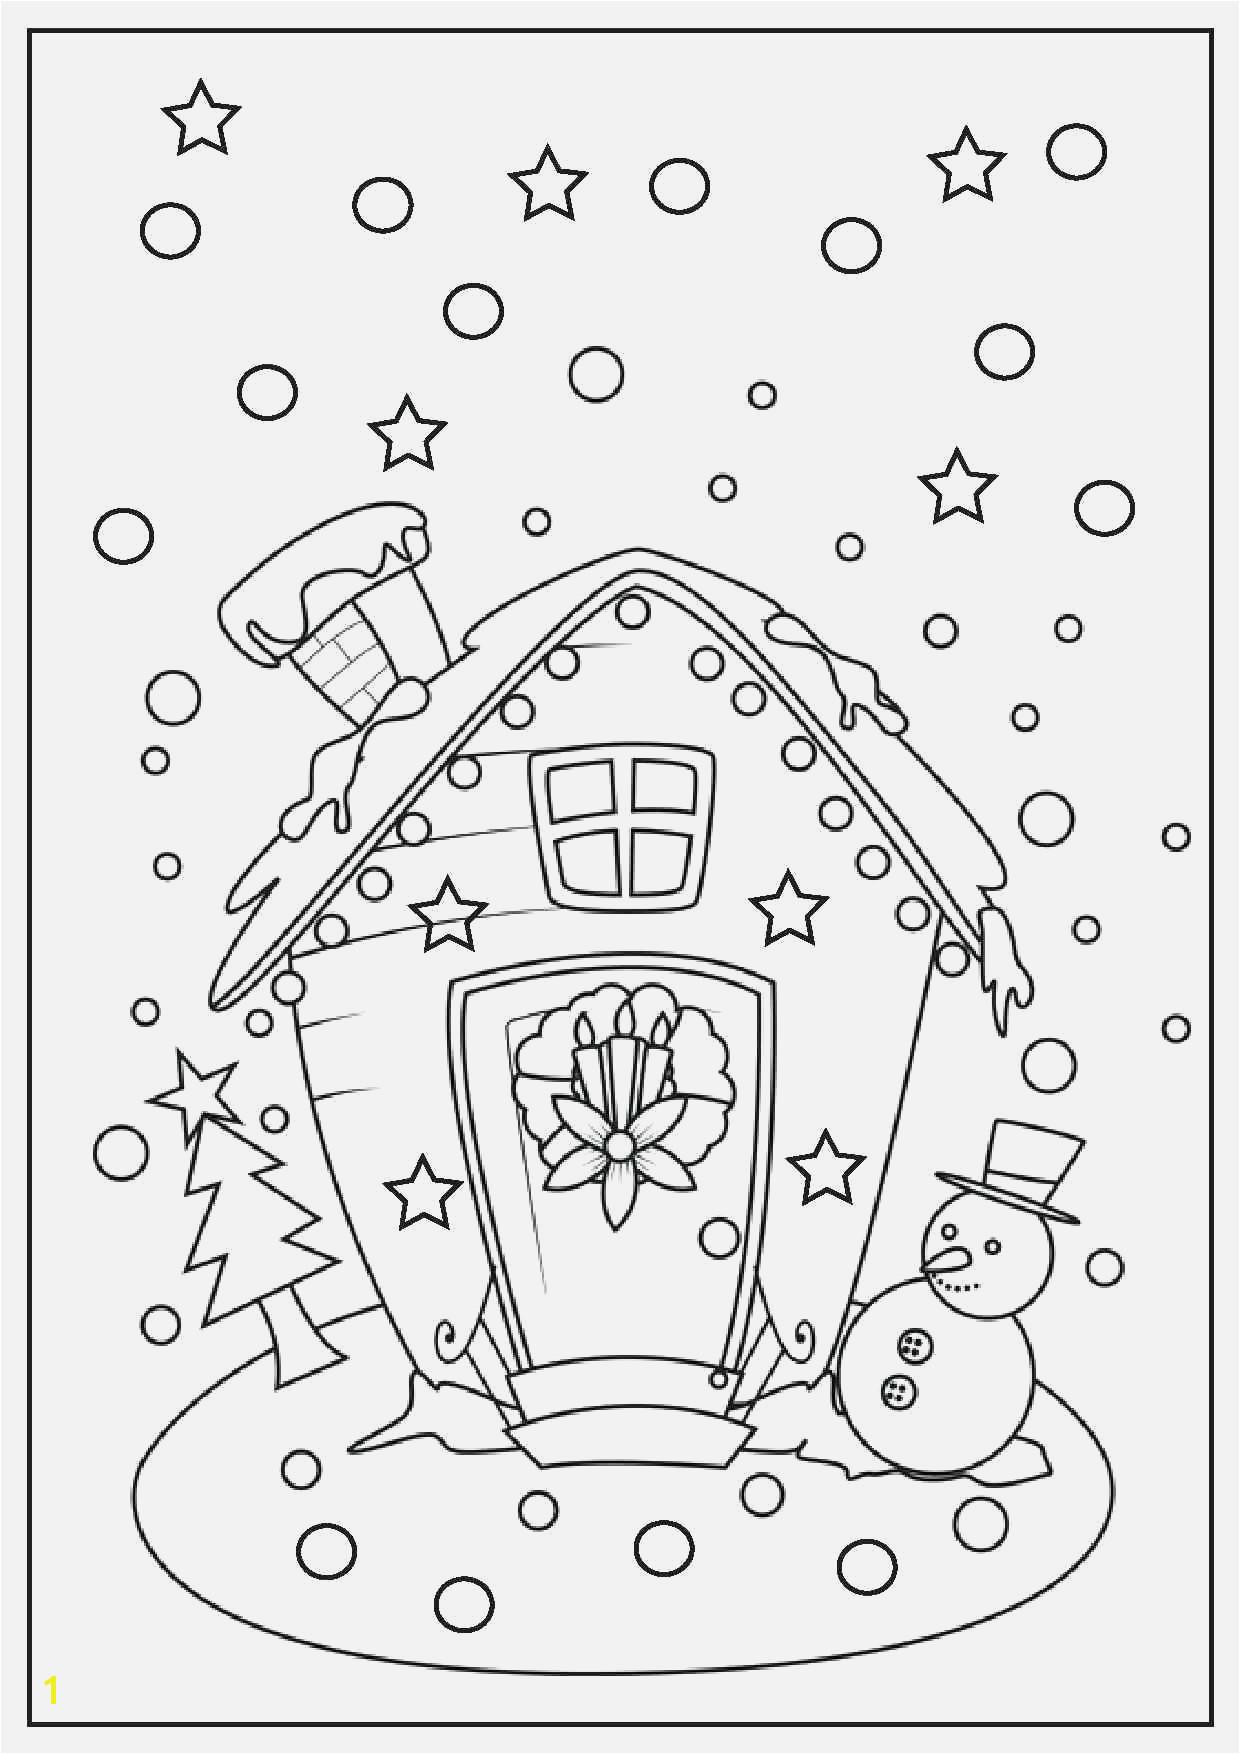 Spongebob Coloring Pages Printable Coloring Pages Coloring Pages Christmas Unique Picture Coloring Line Elegant Color